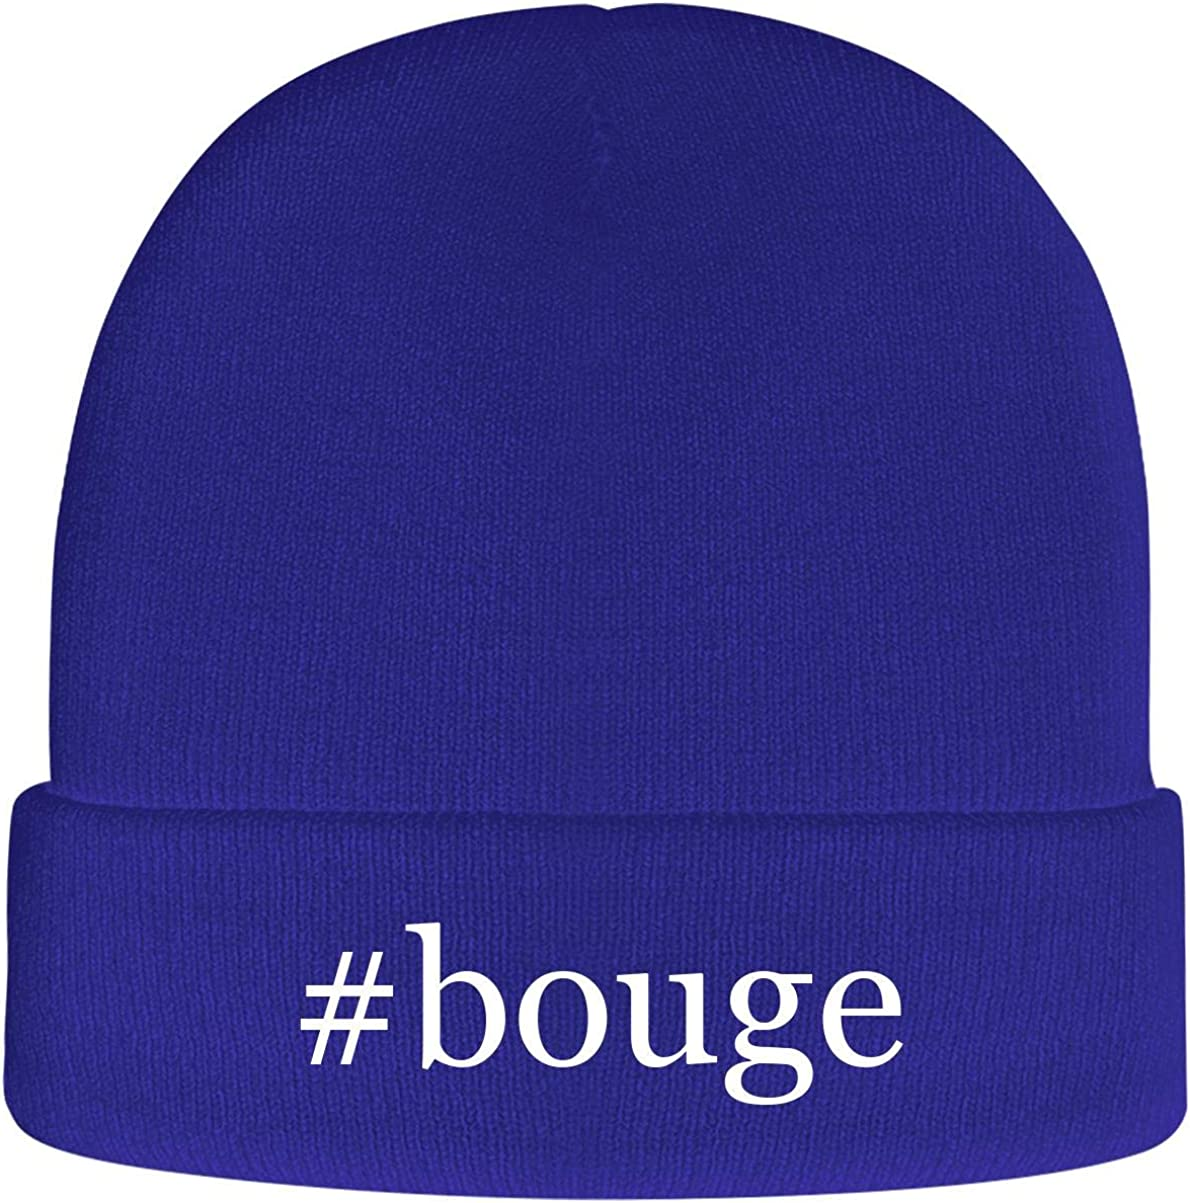 One Legging it Around #Bouge - Hashtag Soft Adult Beanie Cap 71uwmXFzj2L